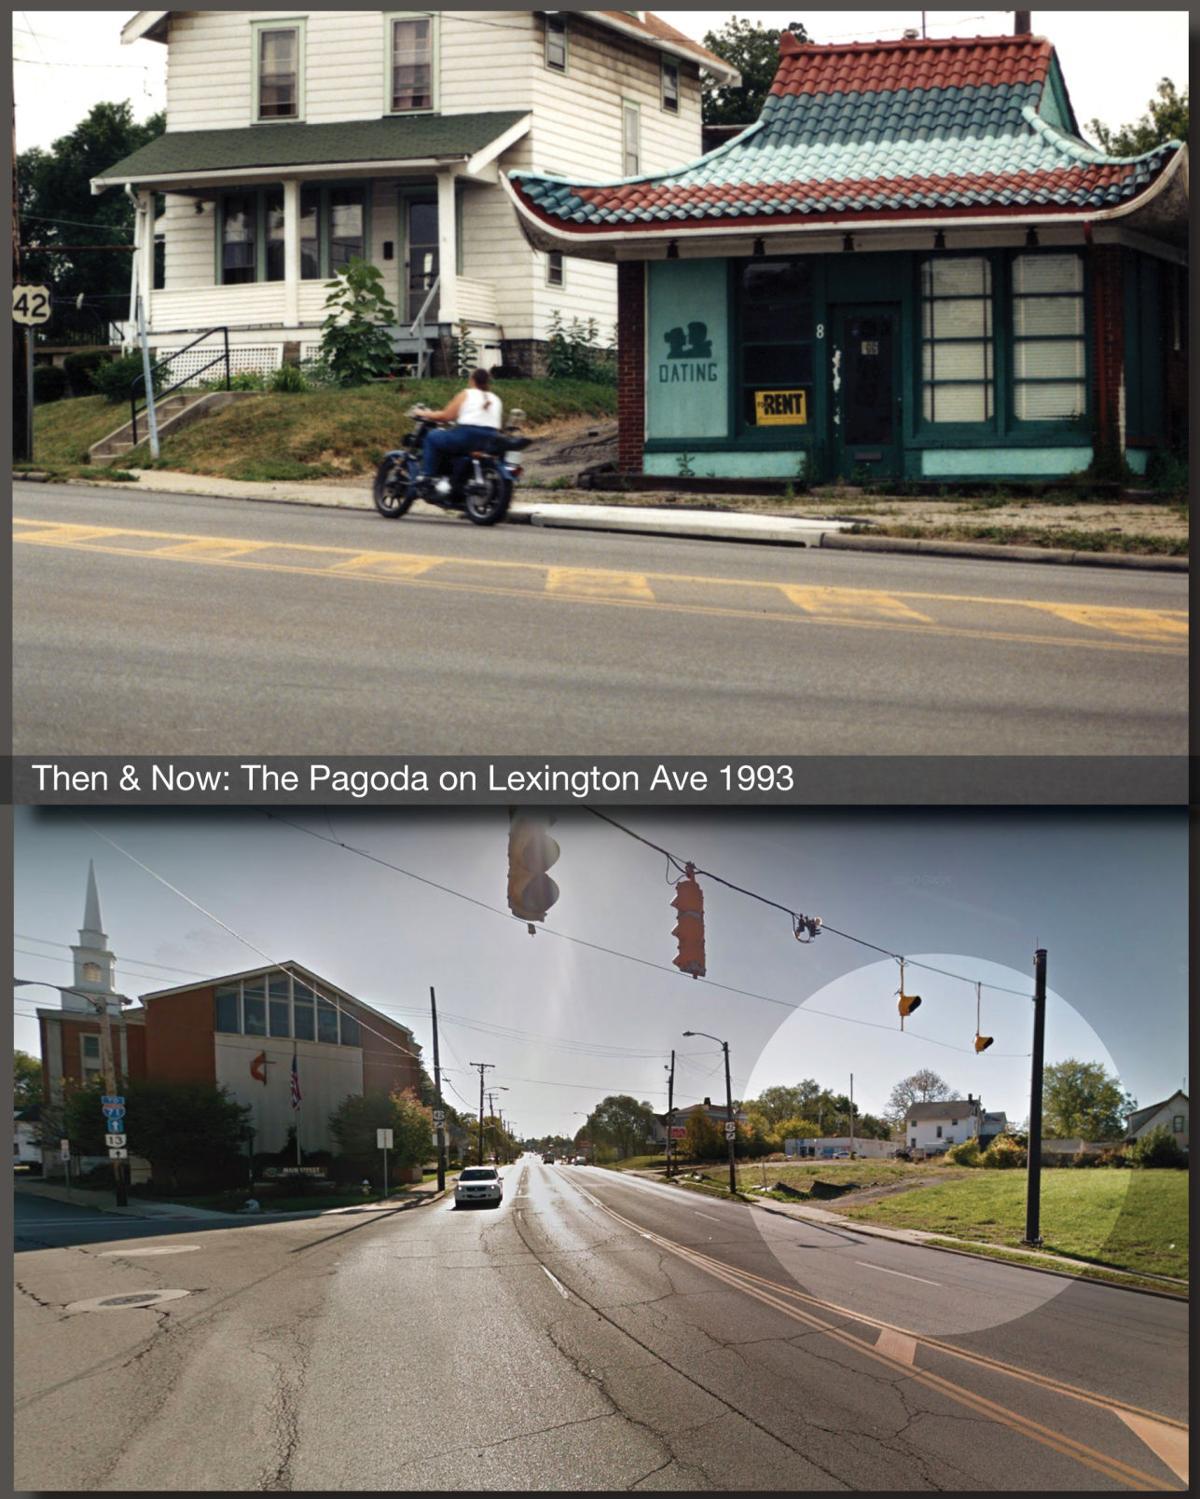 Then & Now: The Pagoda on Lexington Avenue 1993